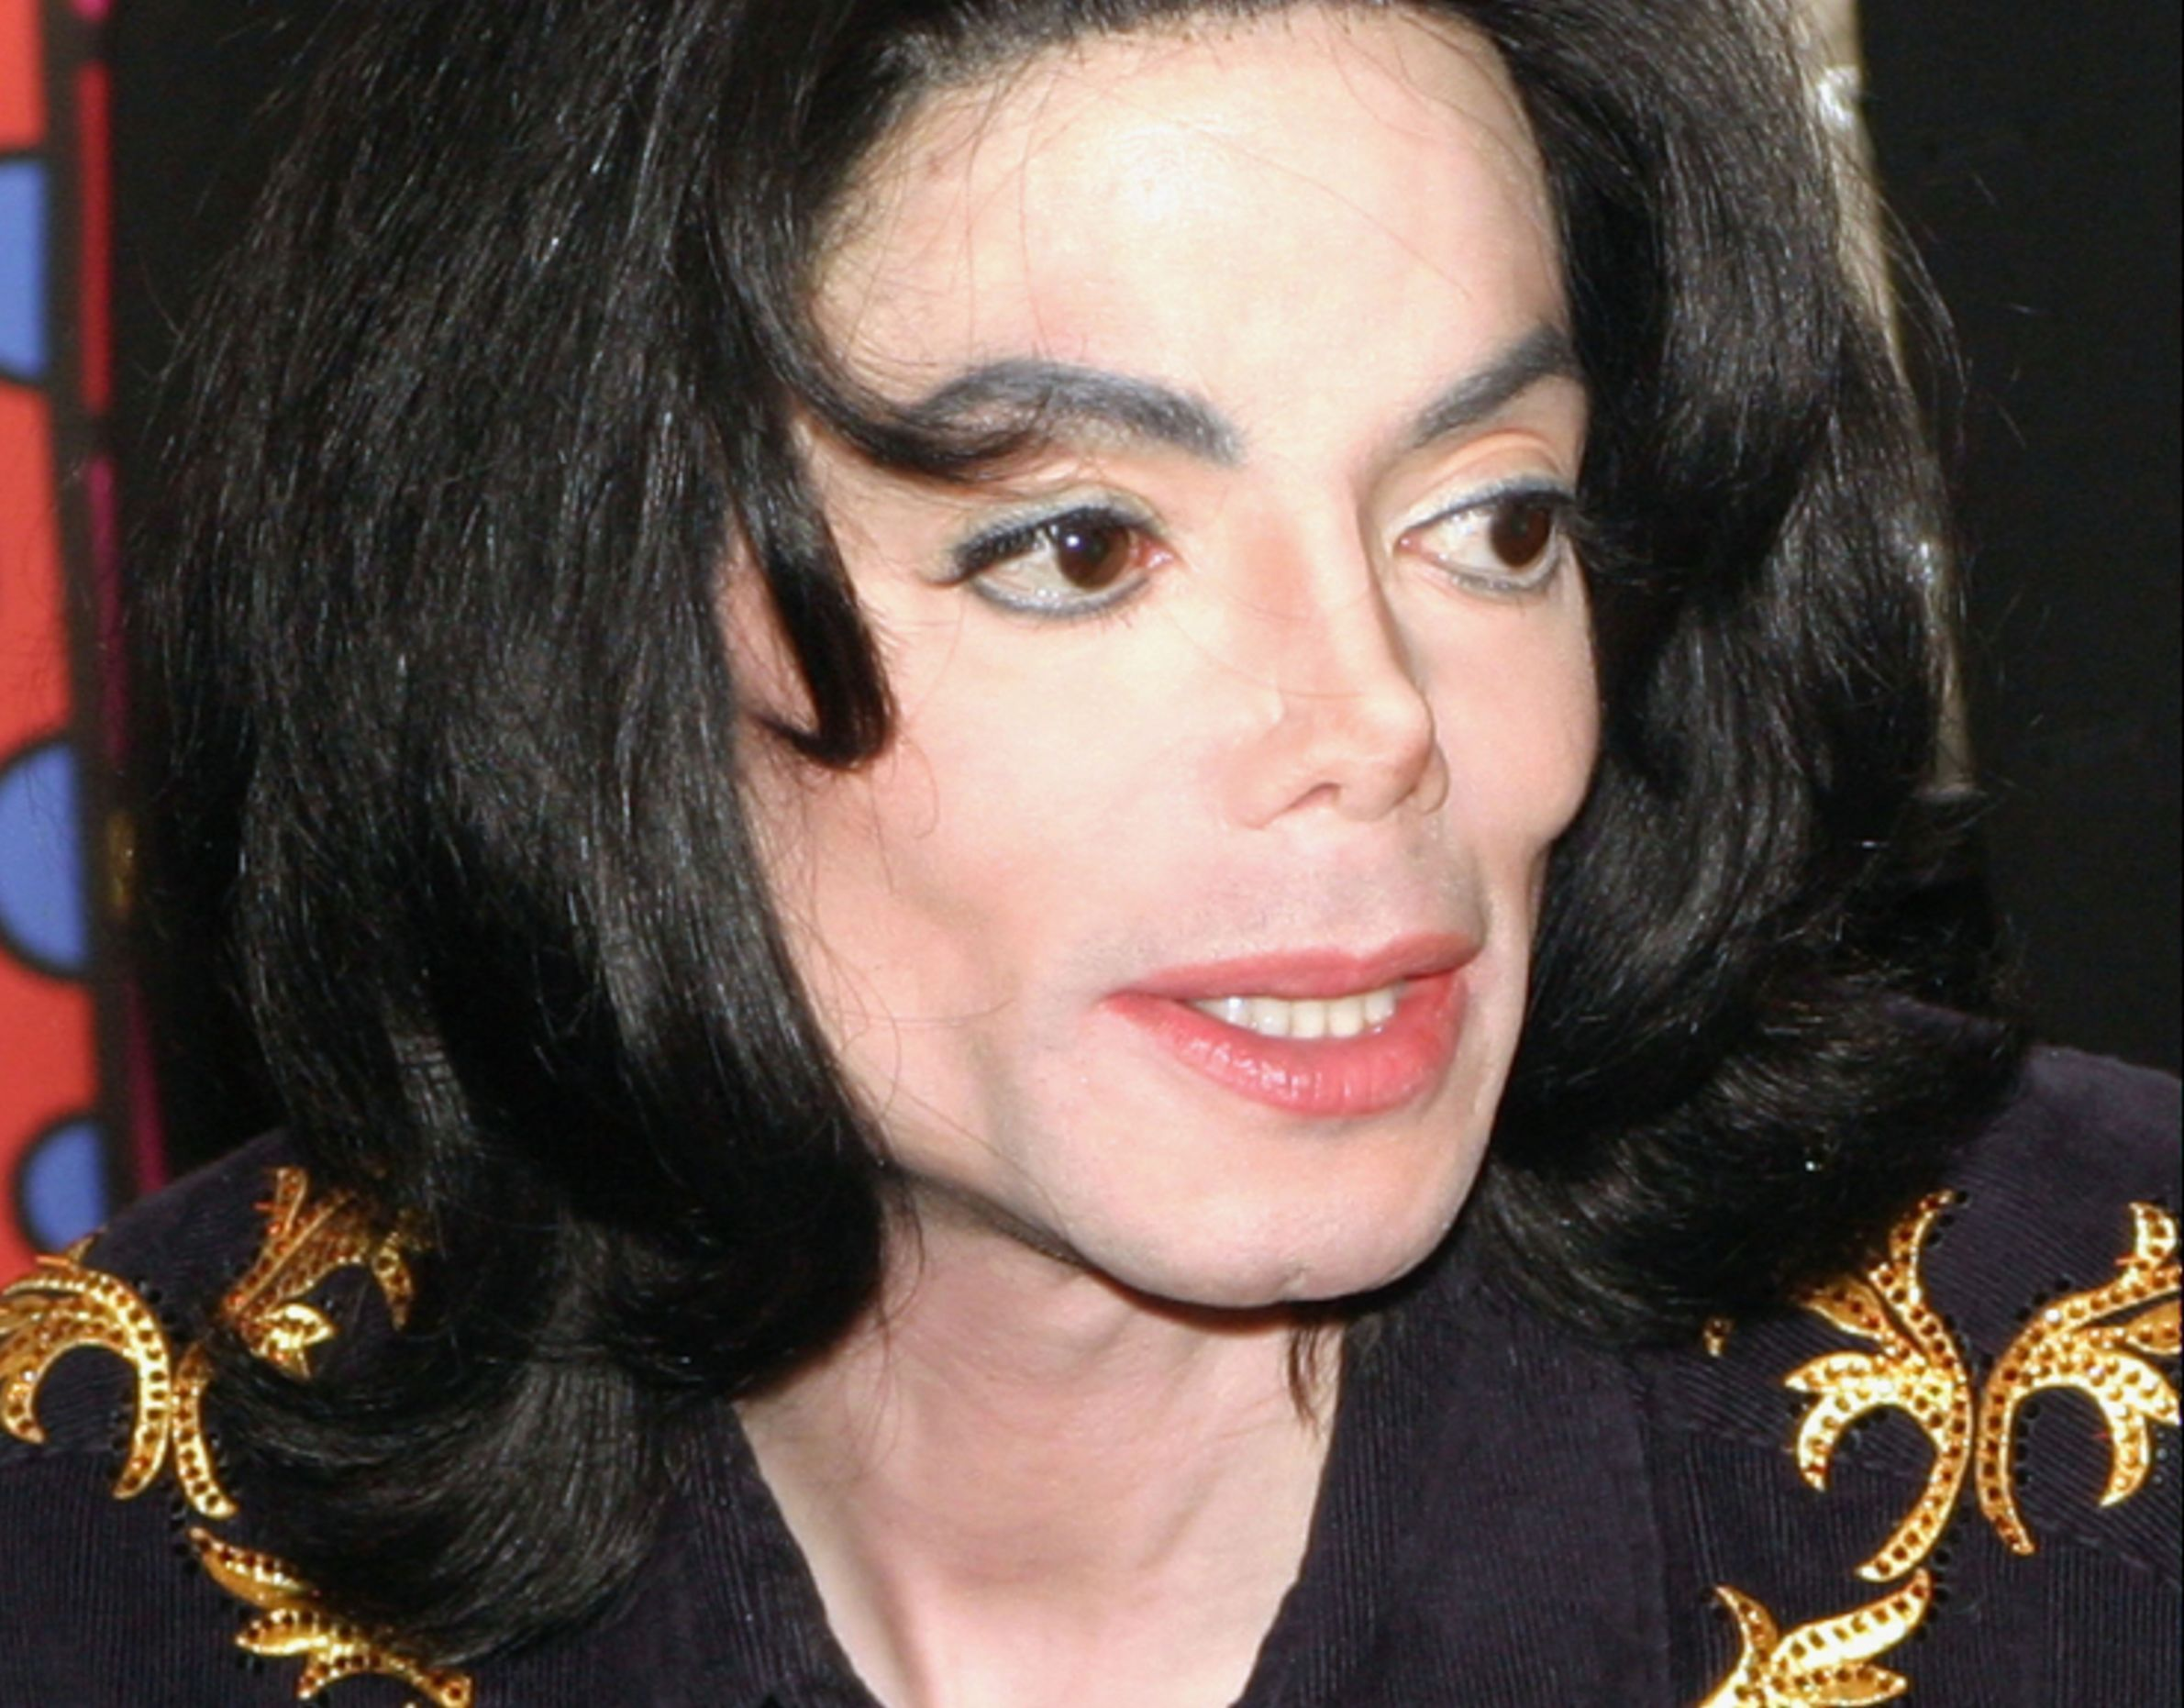 Michael jackson 2002 2009 mj